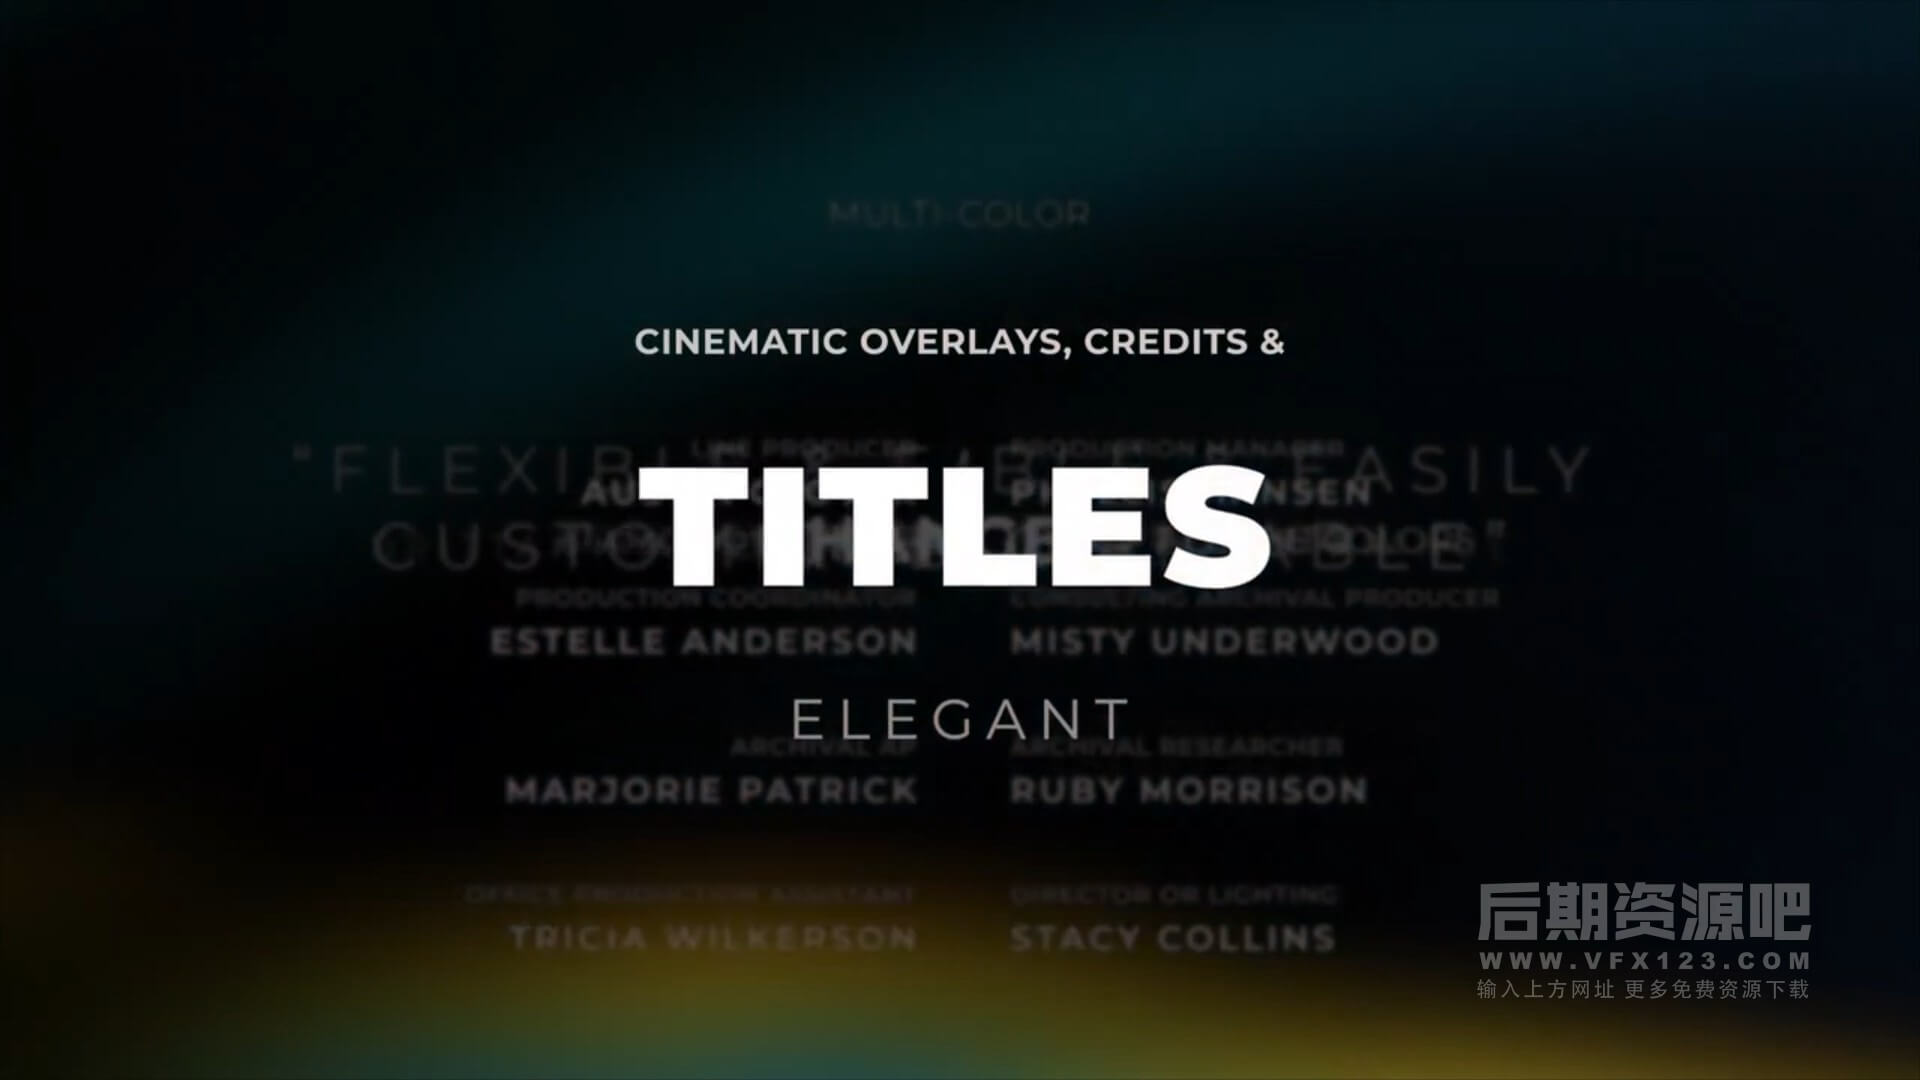 Fcpx插件 21组电影开场片尾演职员字幕模板 Titles Elegant Cinematic 2